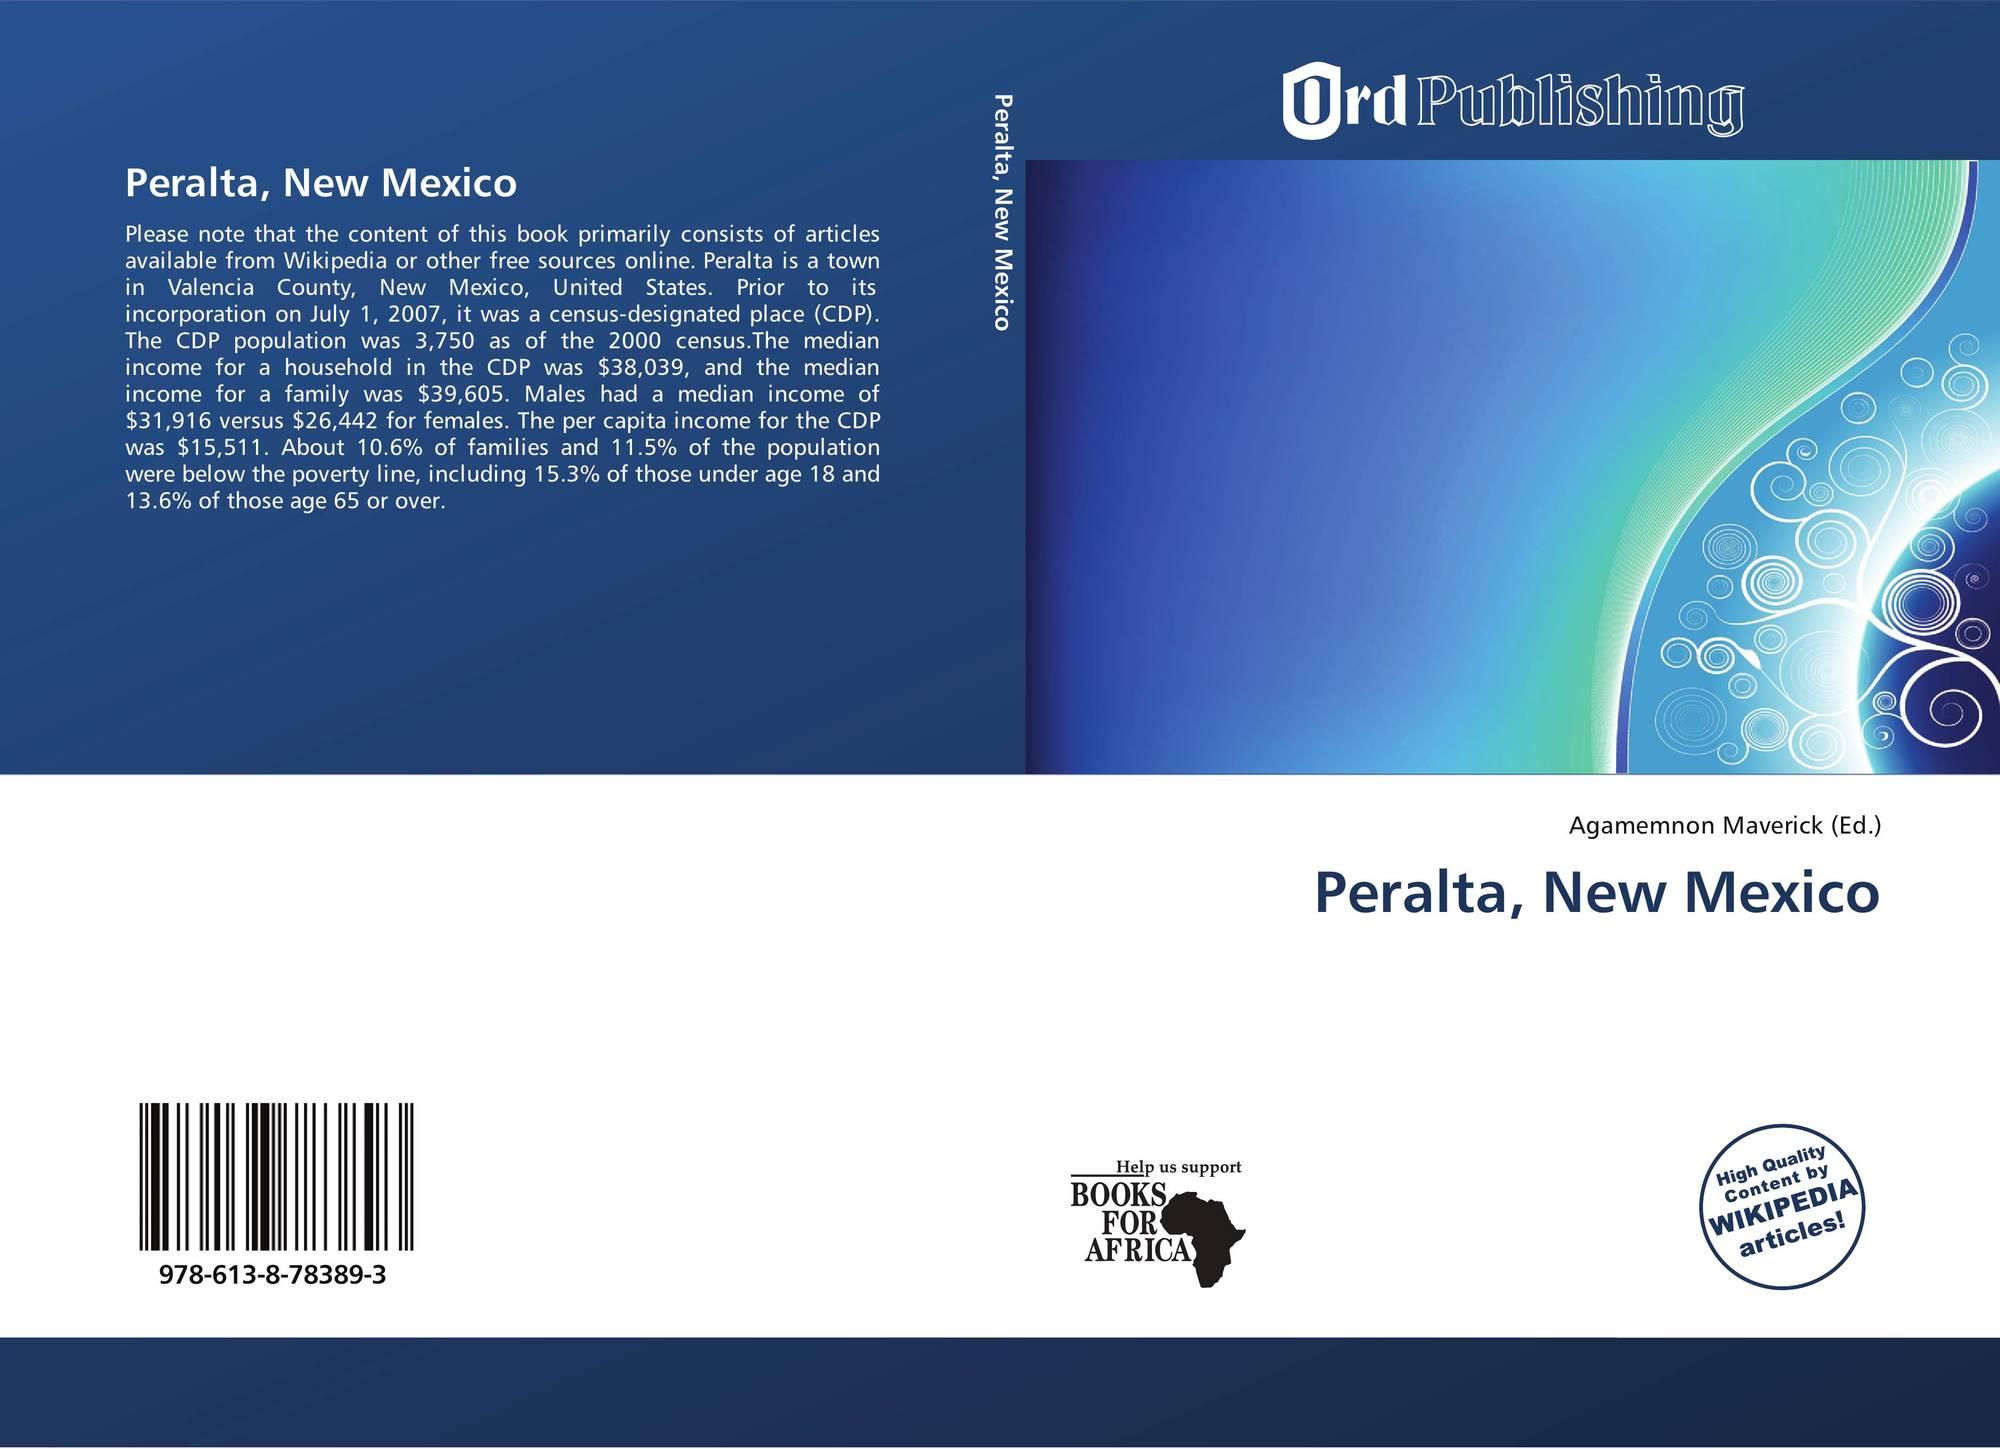 Peralta New Mexico 978 613 8 78389 3 6138783891 9786138783893